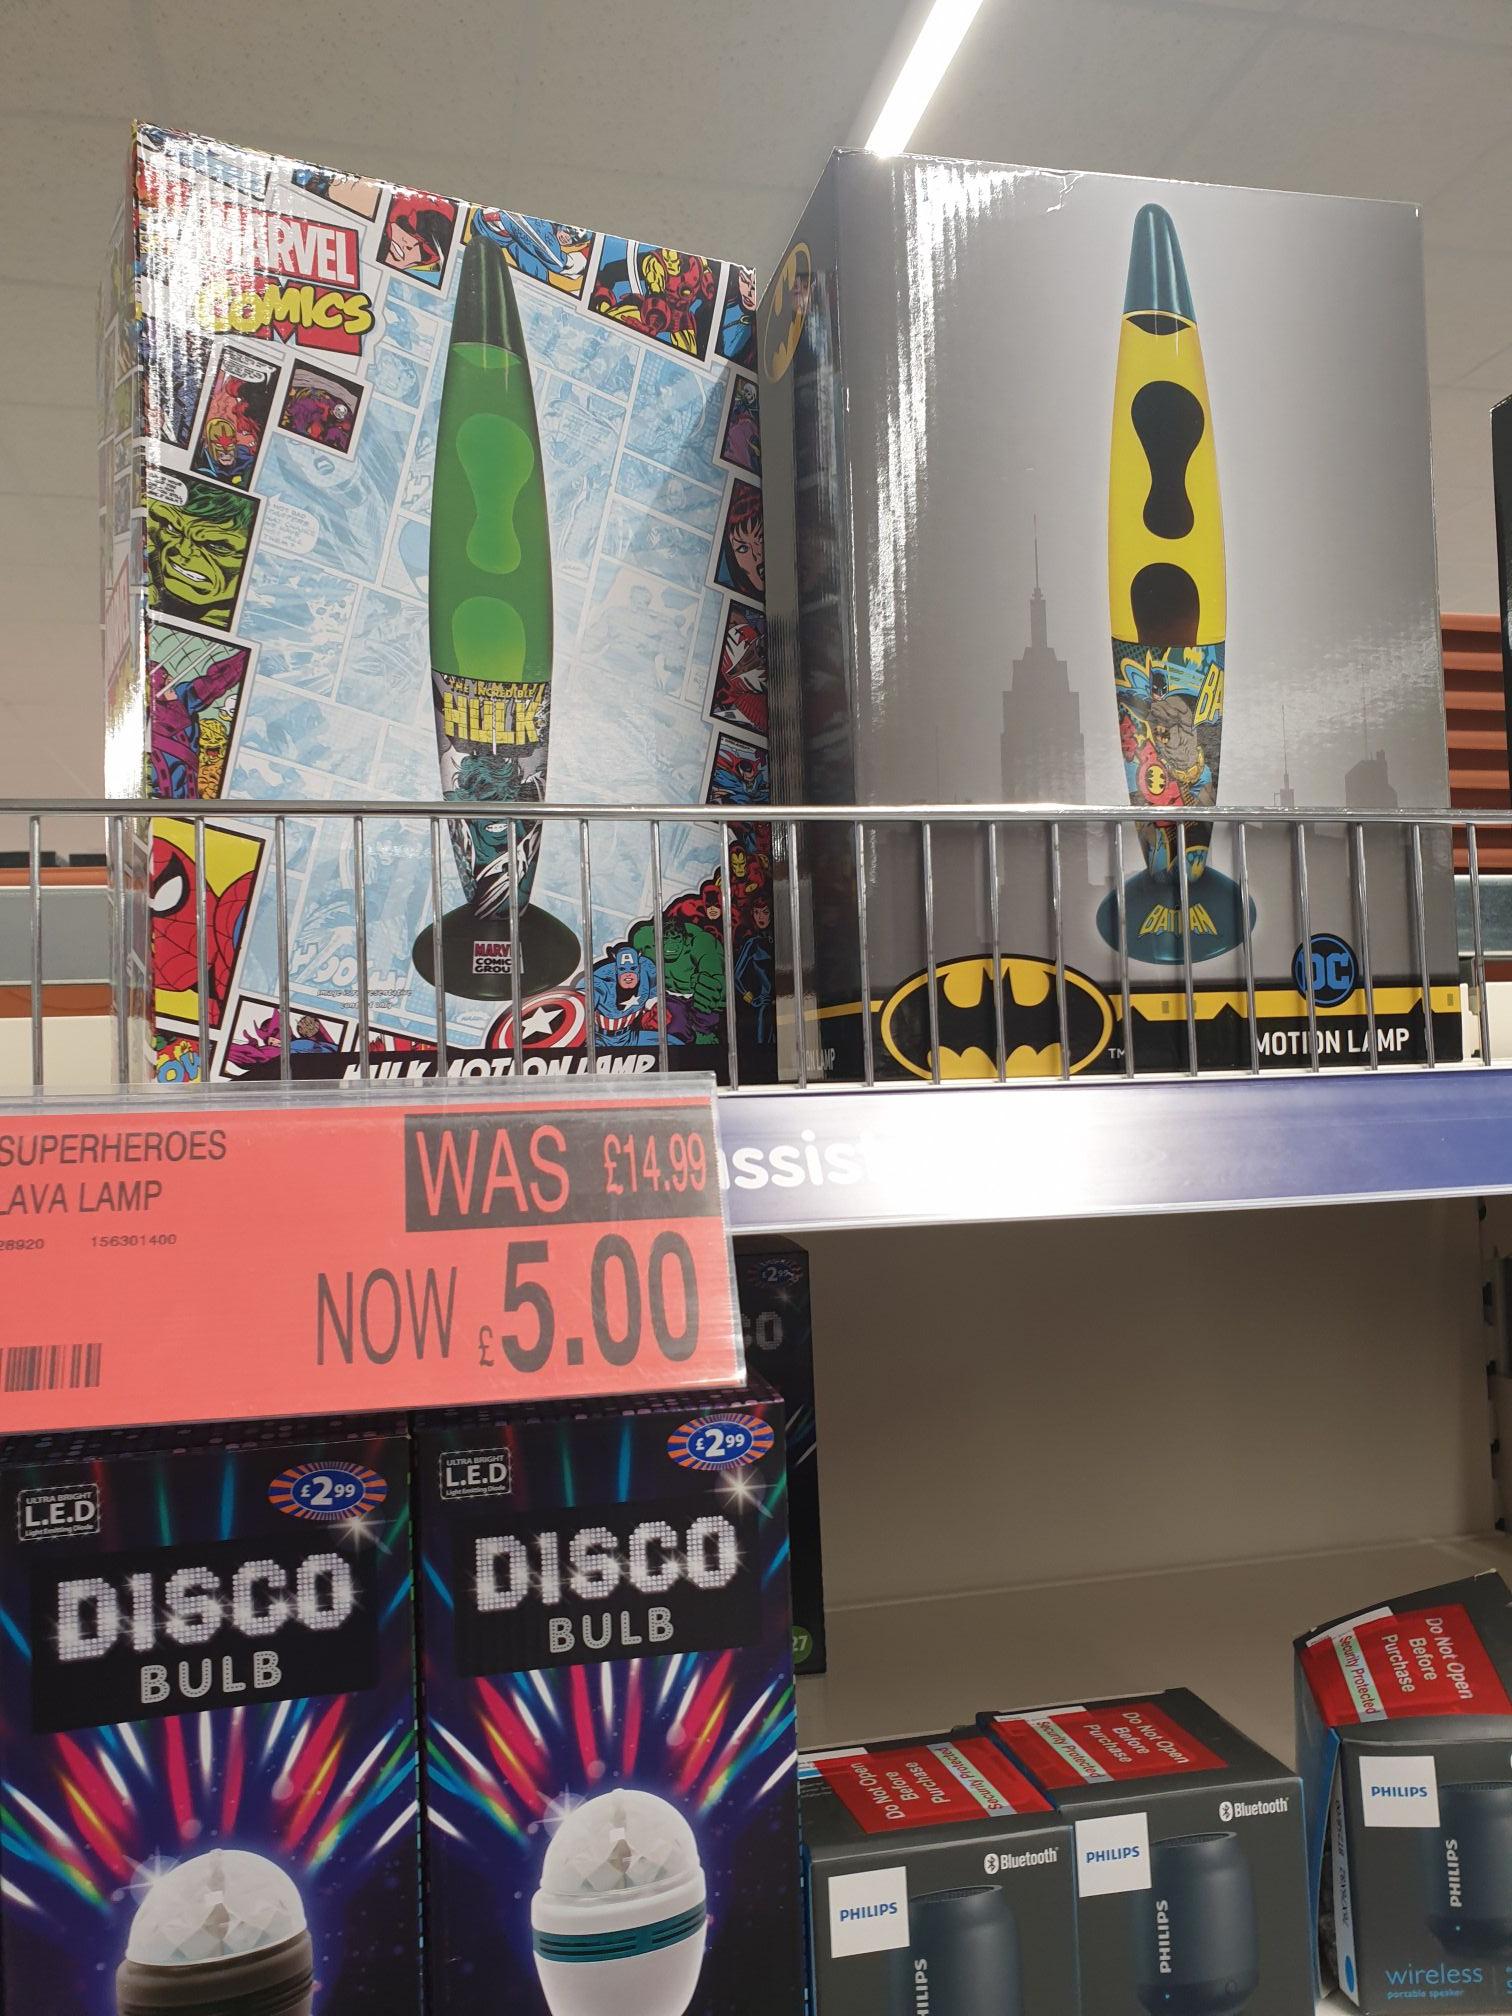 Superheros lava lamp was £14.99 now £5 @b&m